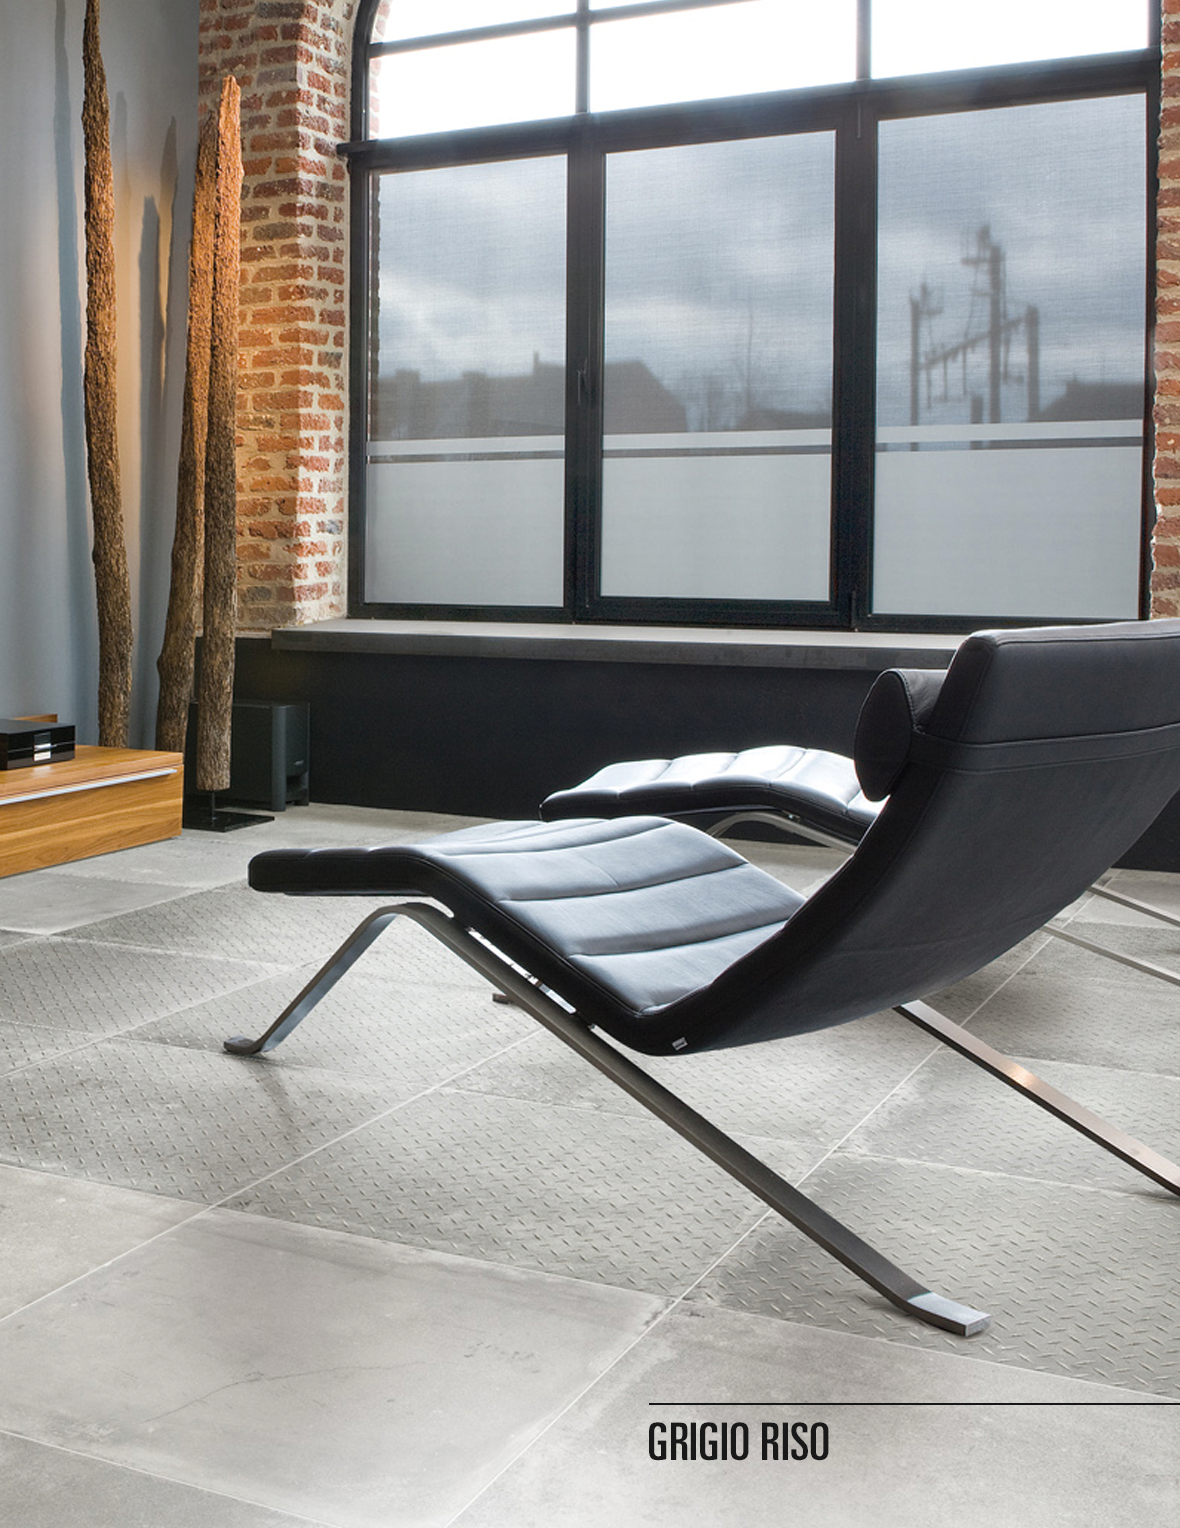 plancher-ceramique-rive-nord-rosemere-soligo-varese-grigio